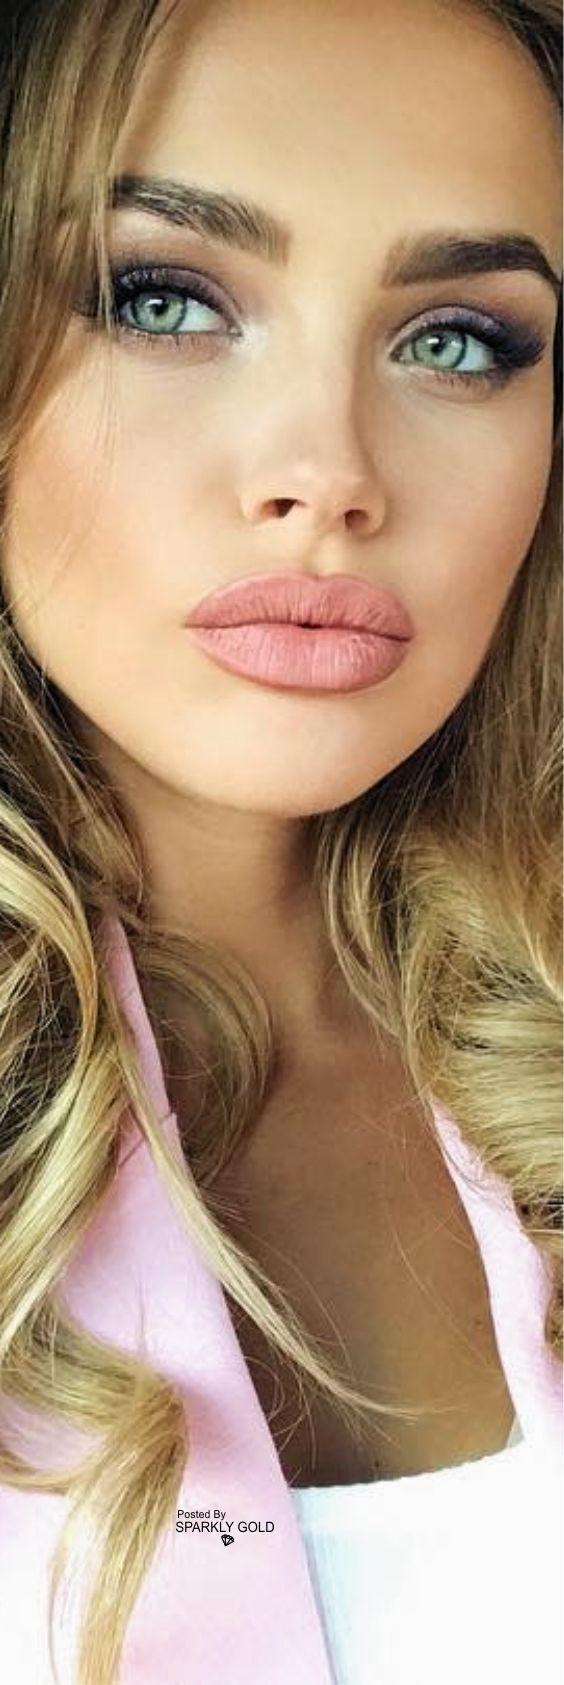 Victoria☆ #lightpinklips #softpinklips #pinklipsblackwomen